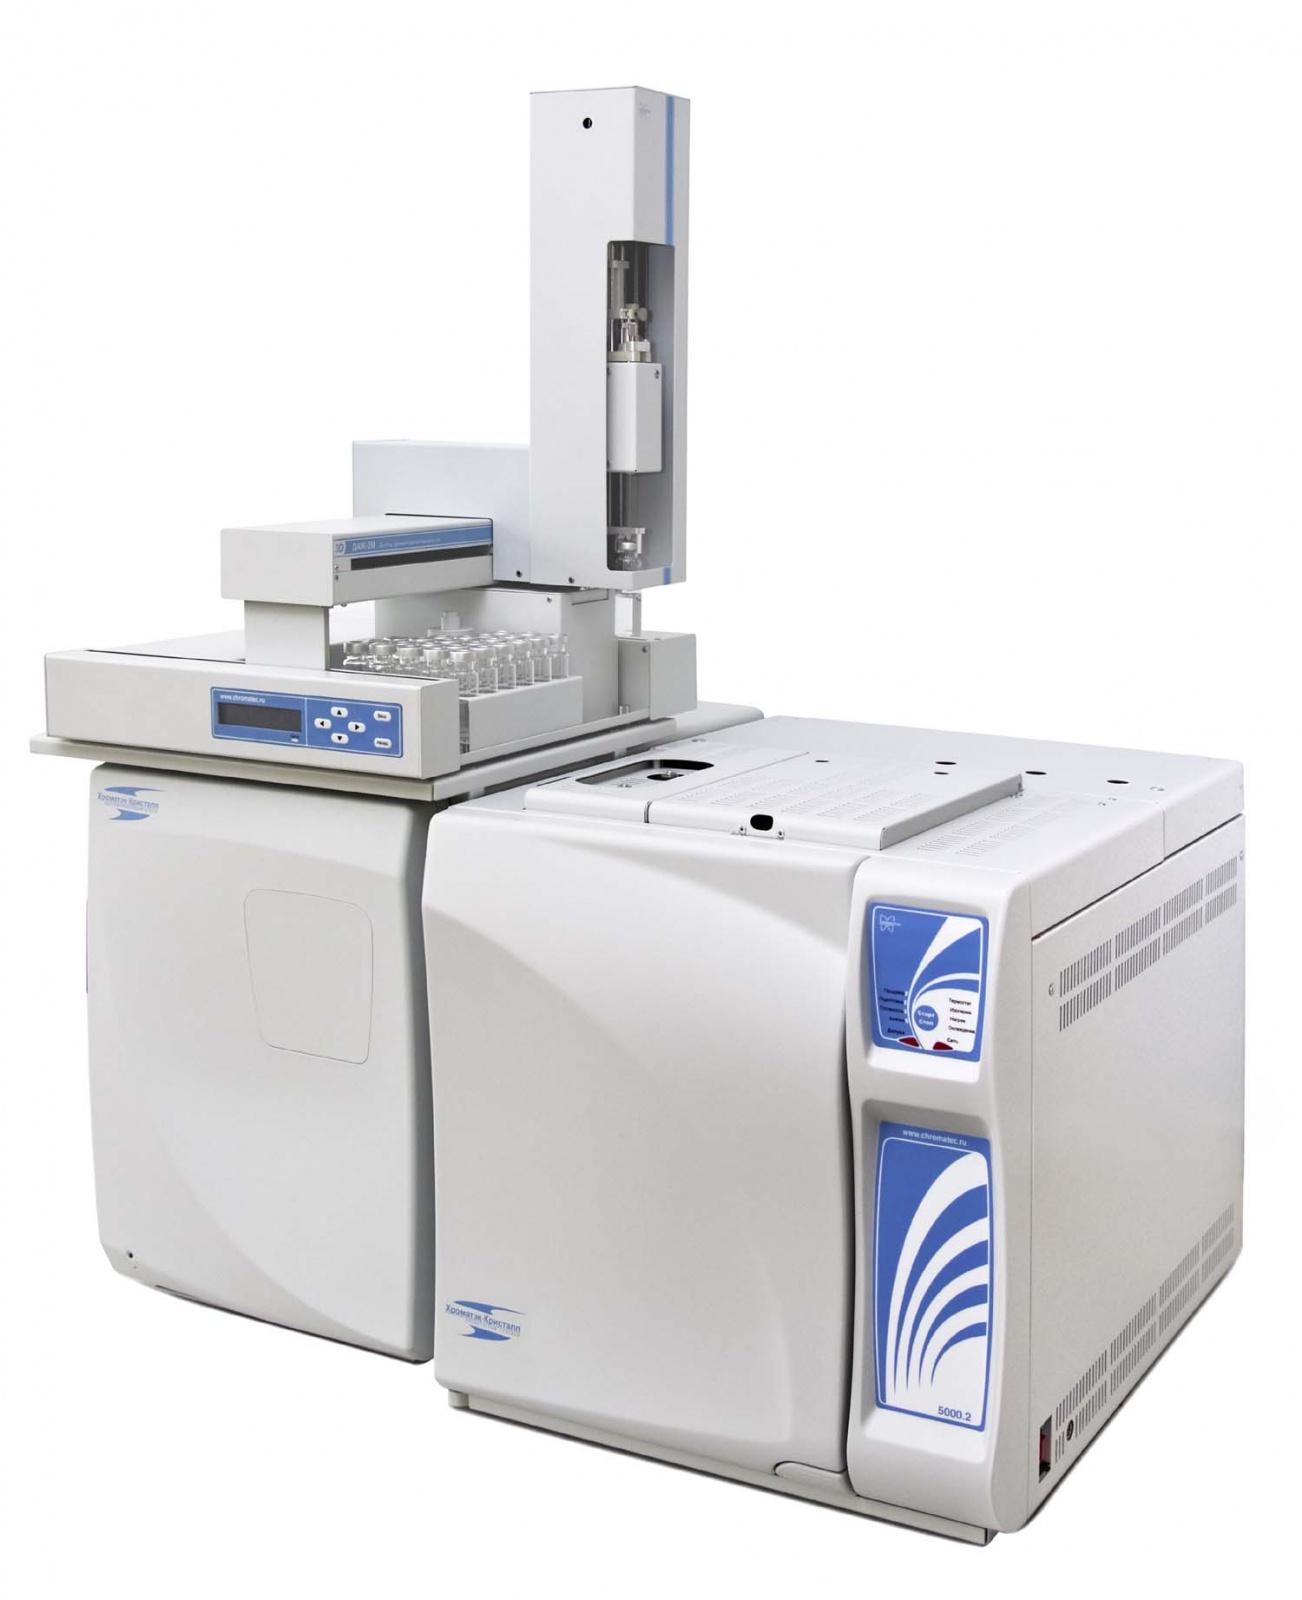 Хромато-масс-спектрометр с МСД Хроматэк